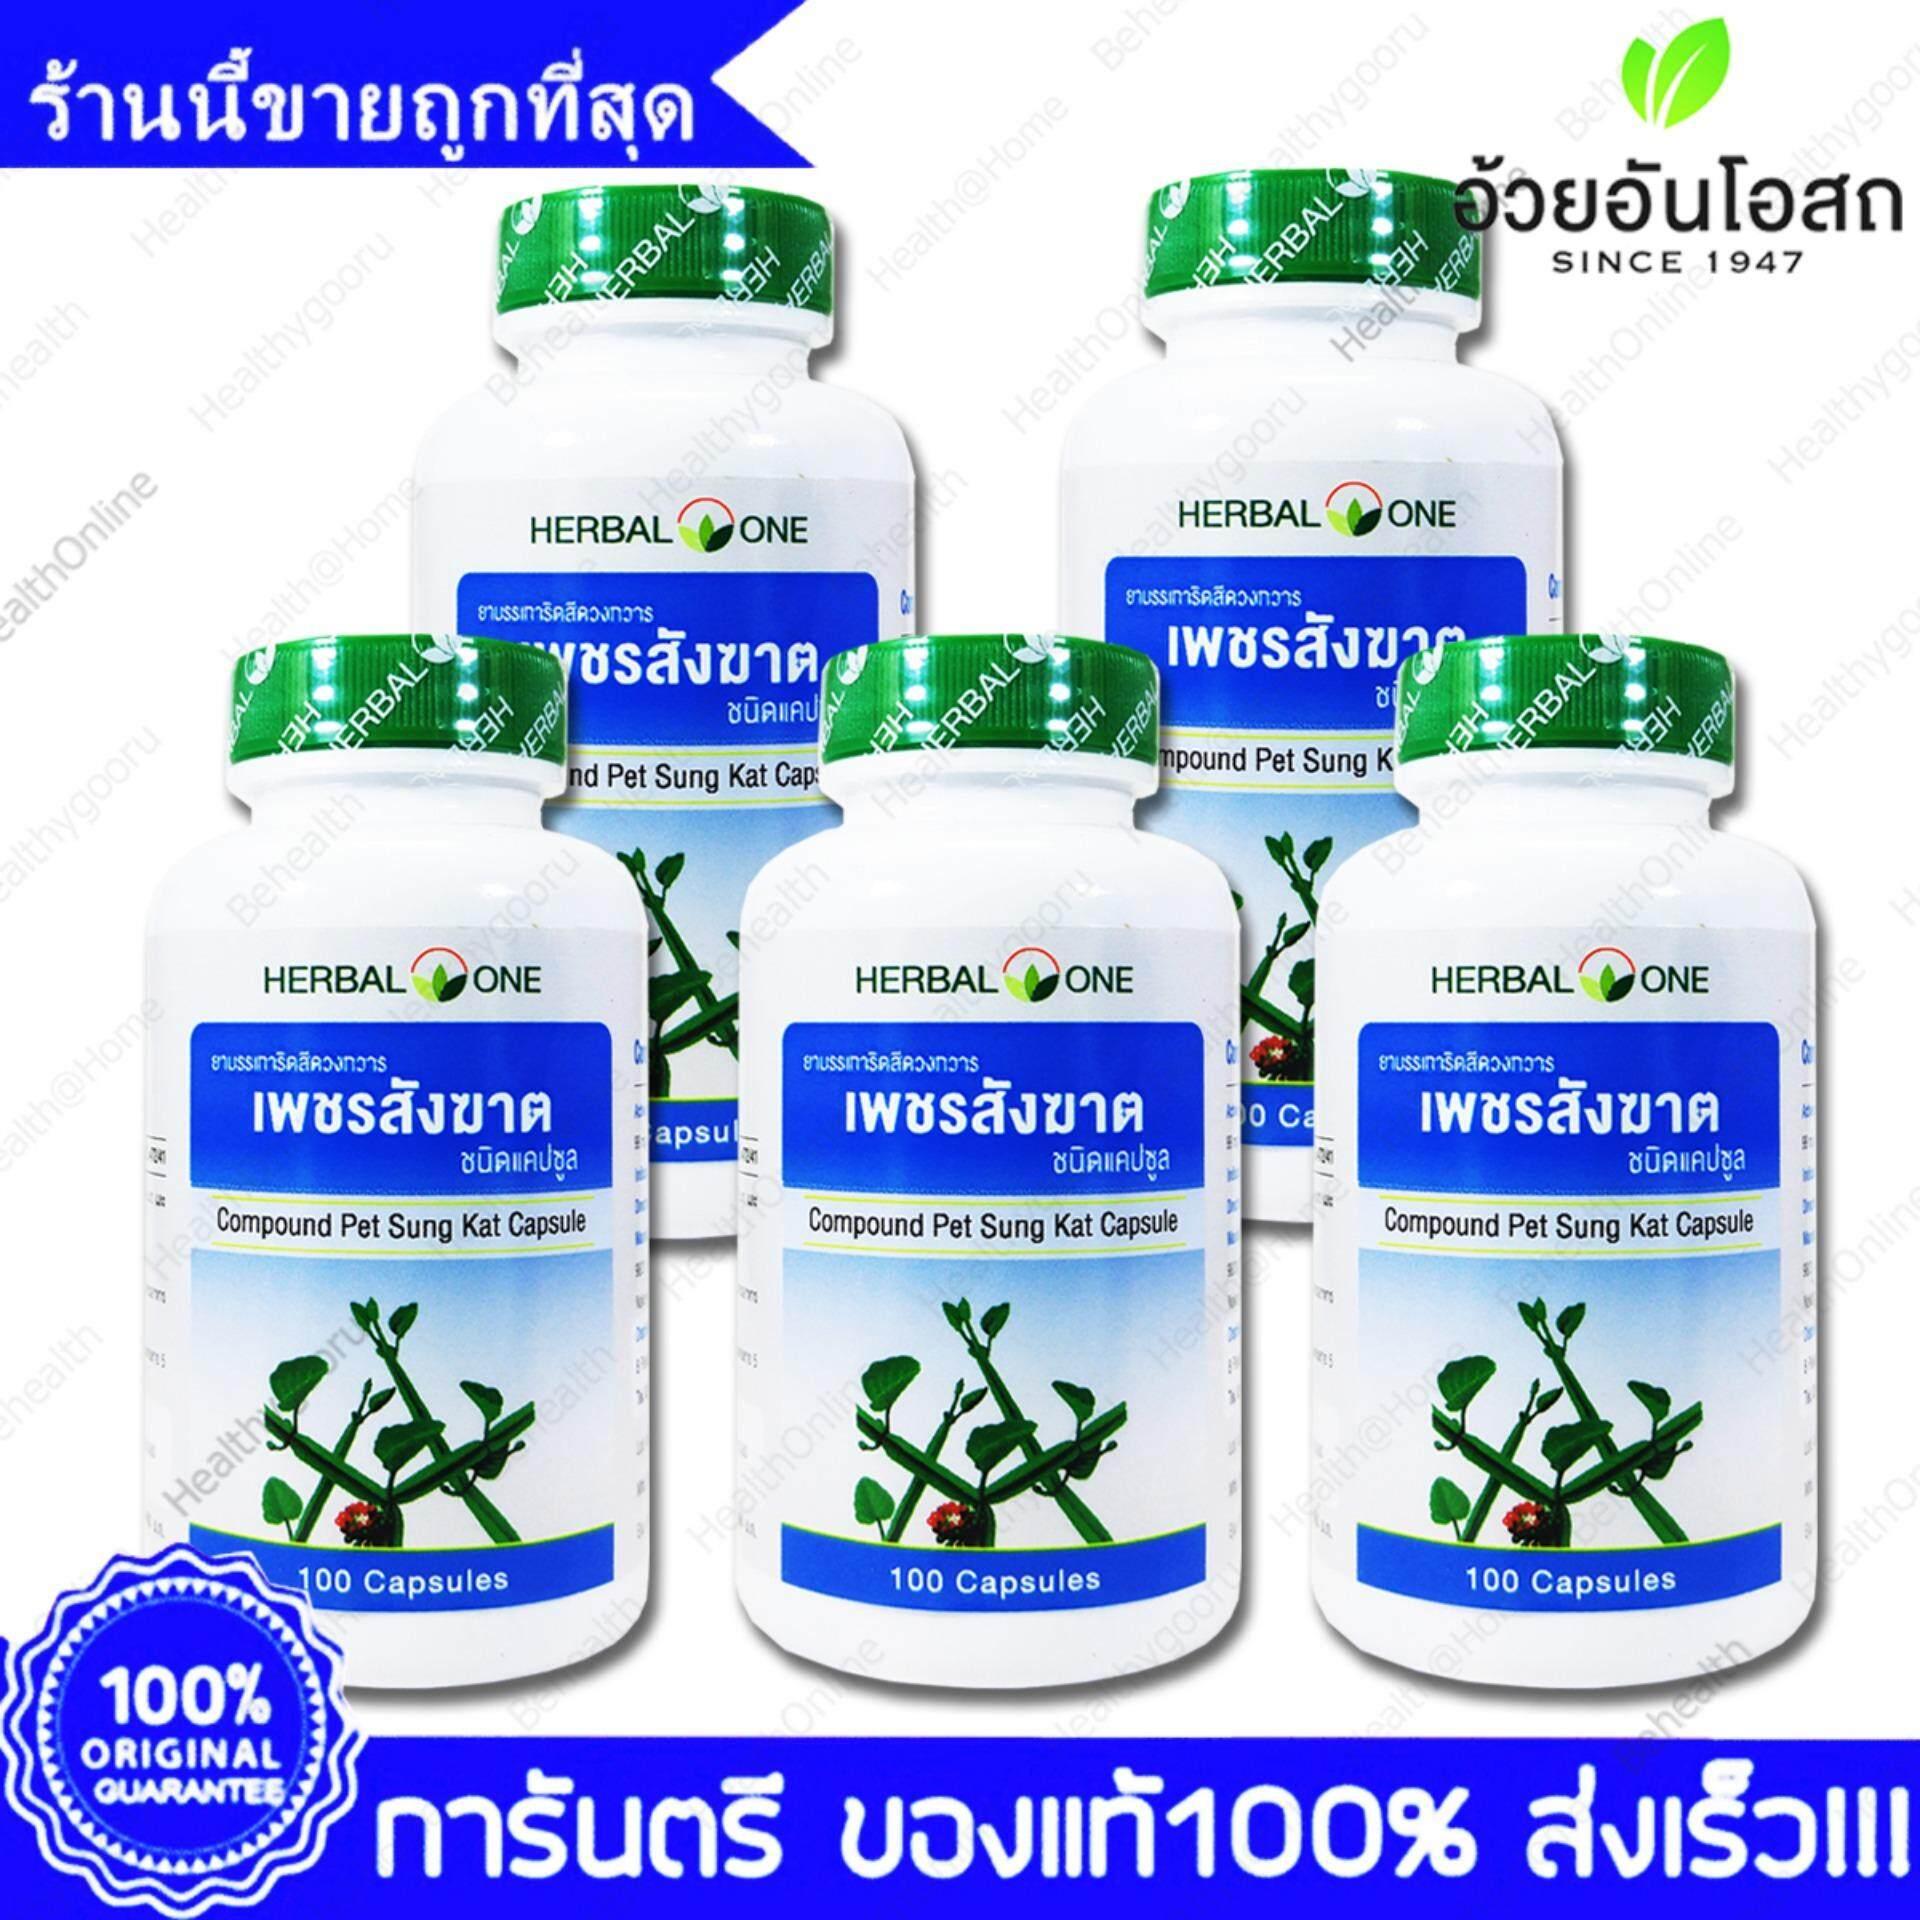 Herbal One Pet Sung Kat Cissus Quadrangularis เพชรสังฆาต อ้วยอัน ริดสีดวง ระบาย 100 แคปซูล(capsules) X 5 ขวด(bottles) By Health@home.